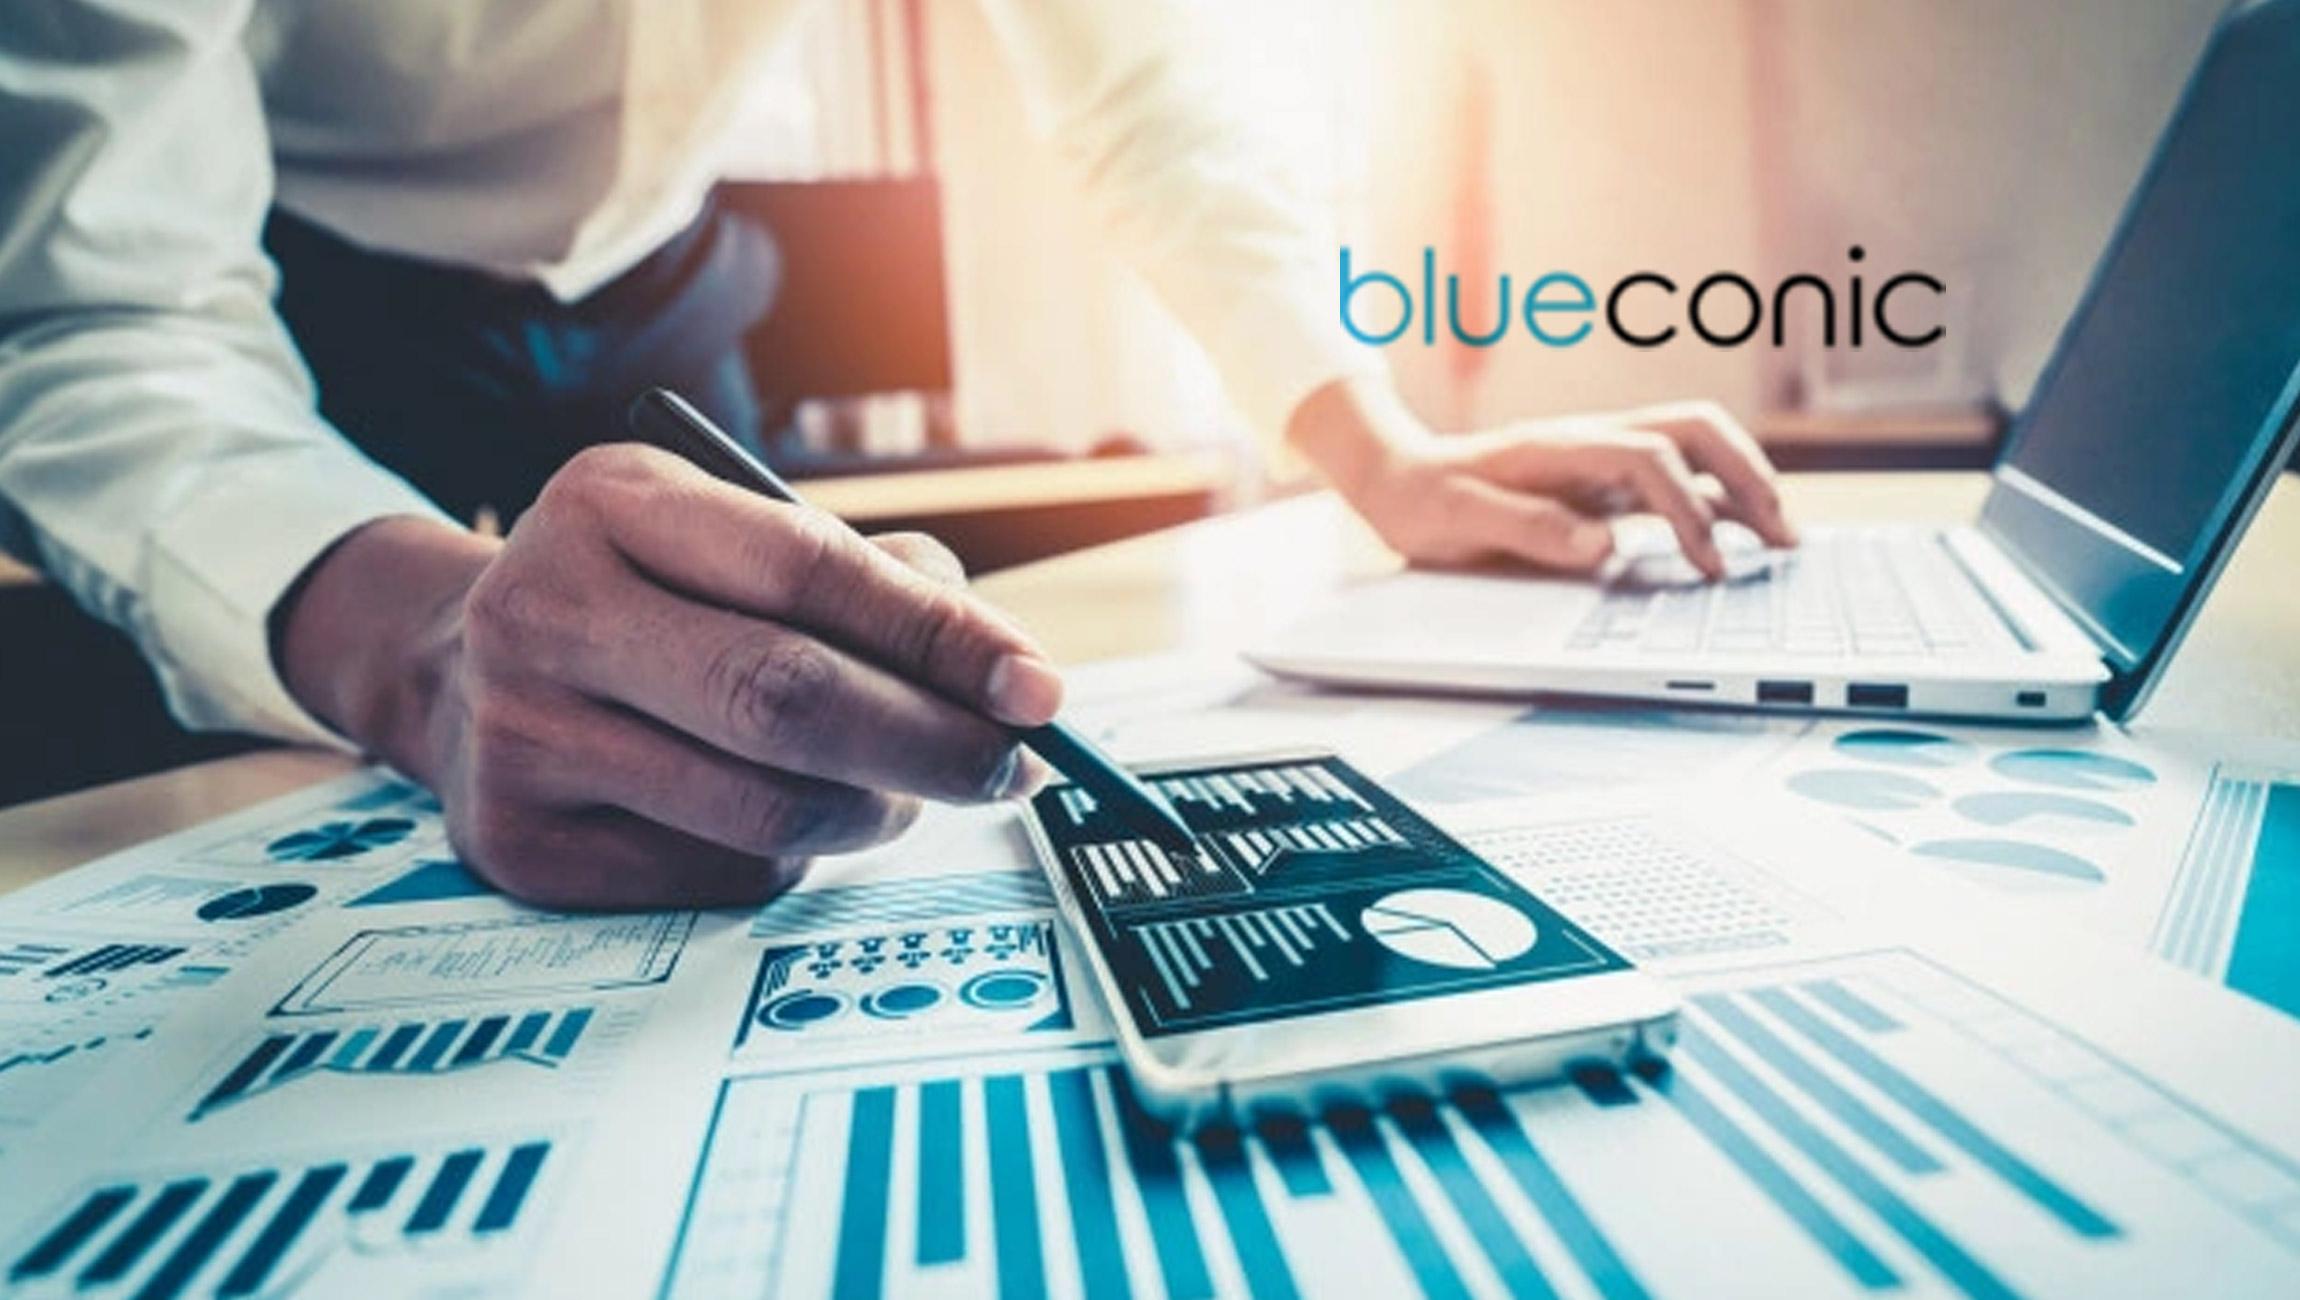 BlueConic Completes SOC 2 Type 2 Audit